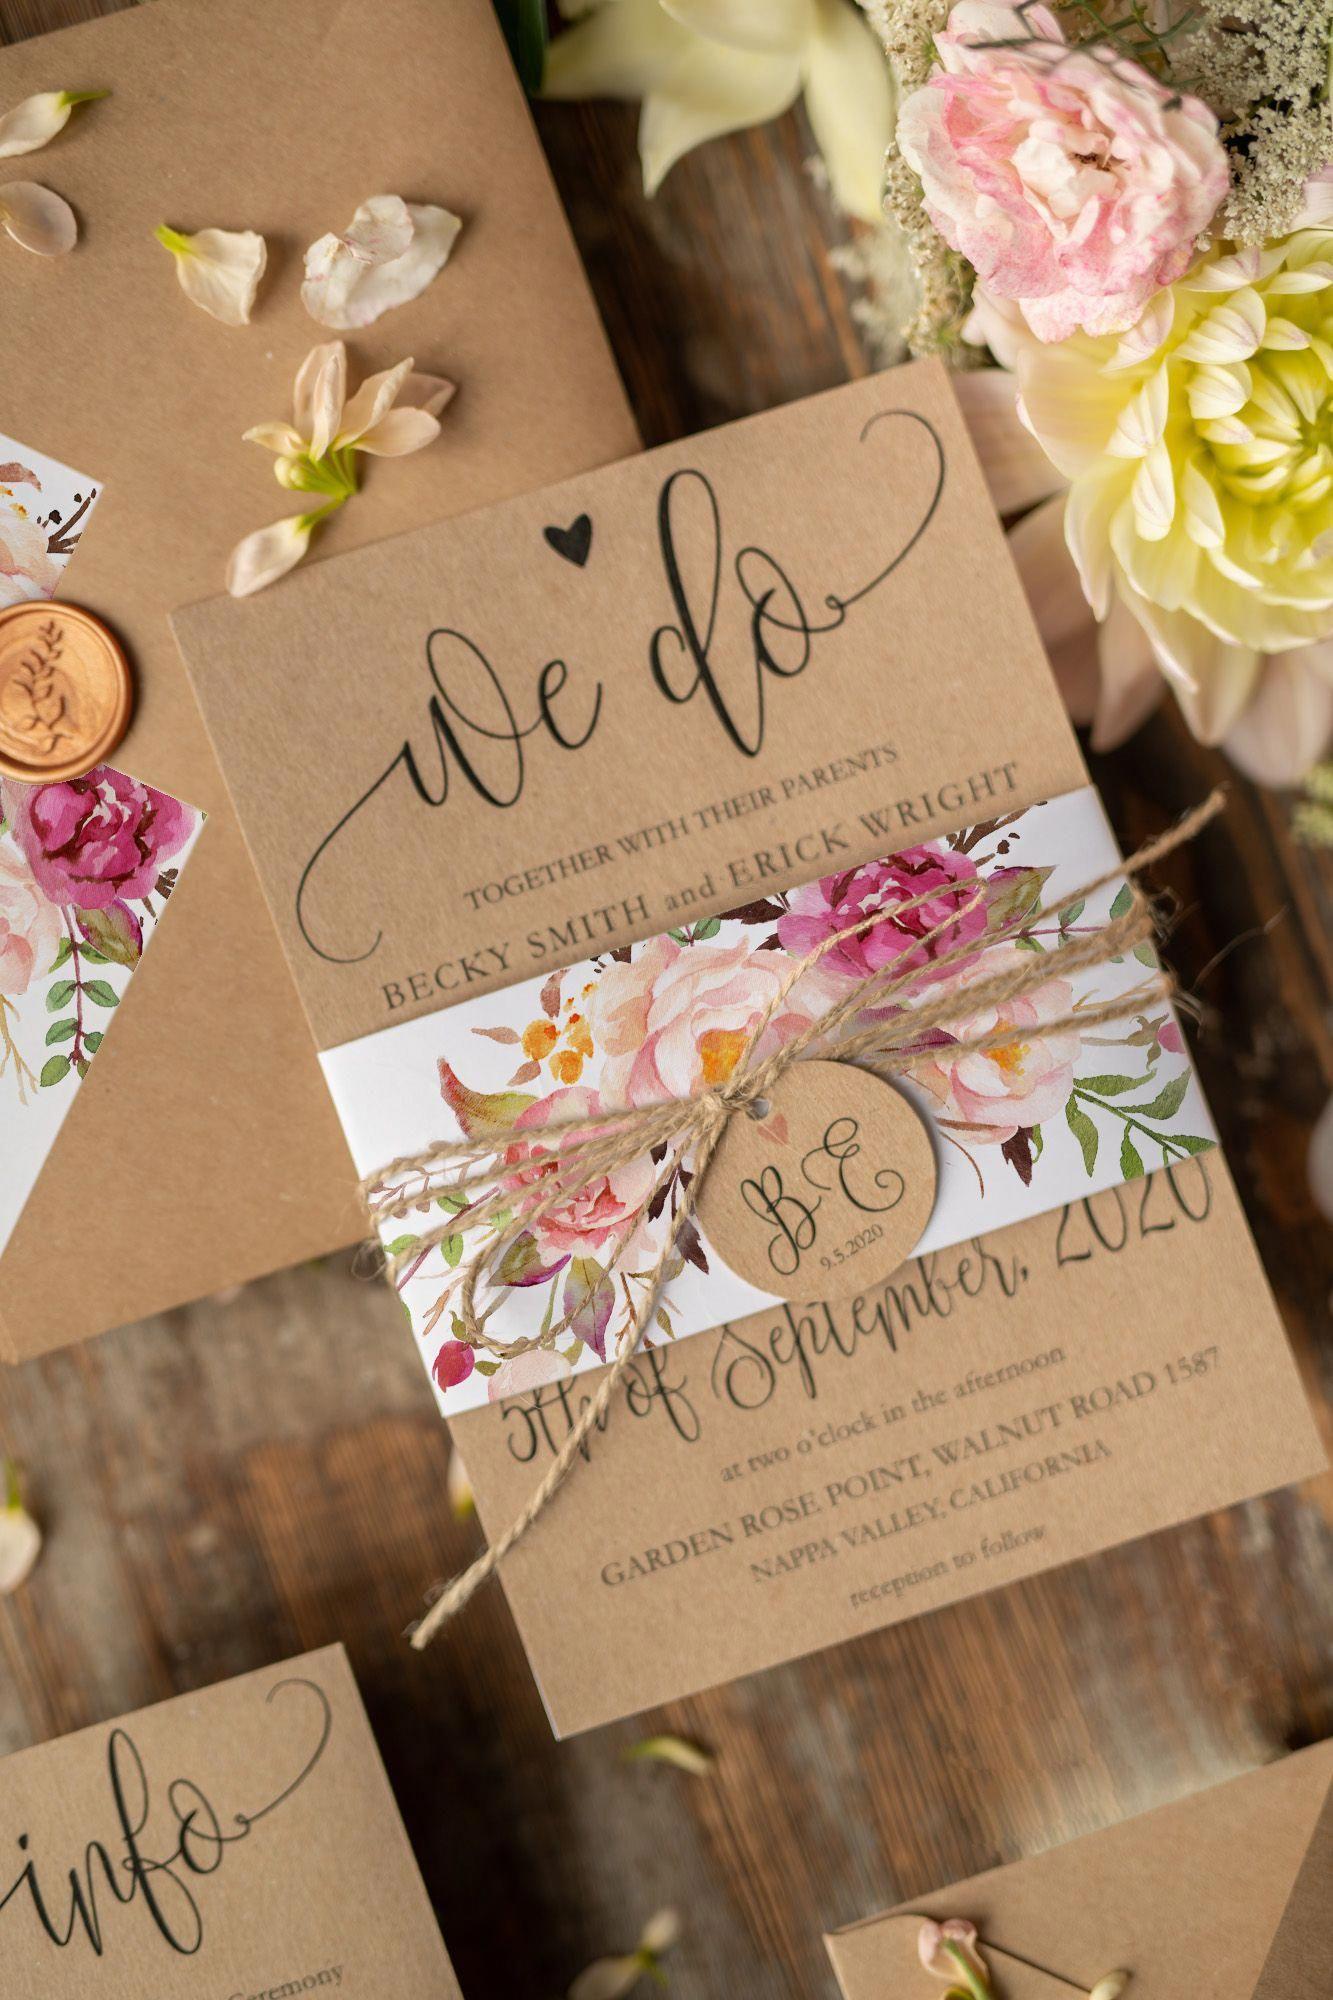 Wedding decorations lilac september 2018 WEDDING INVITATIONS Wcgz weddingideas  Wedding Ideas in